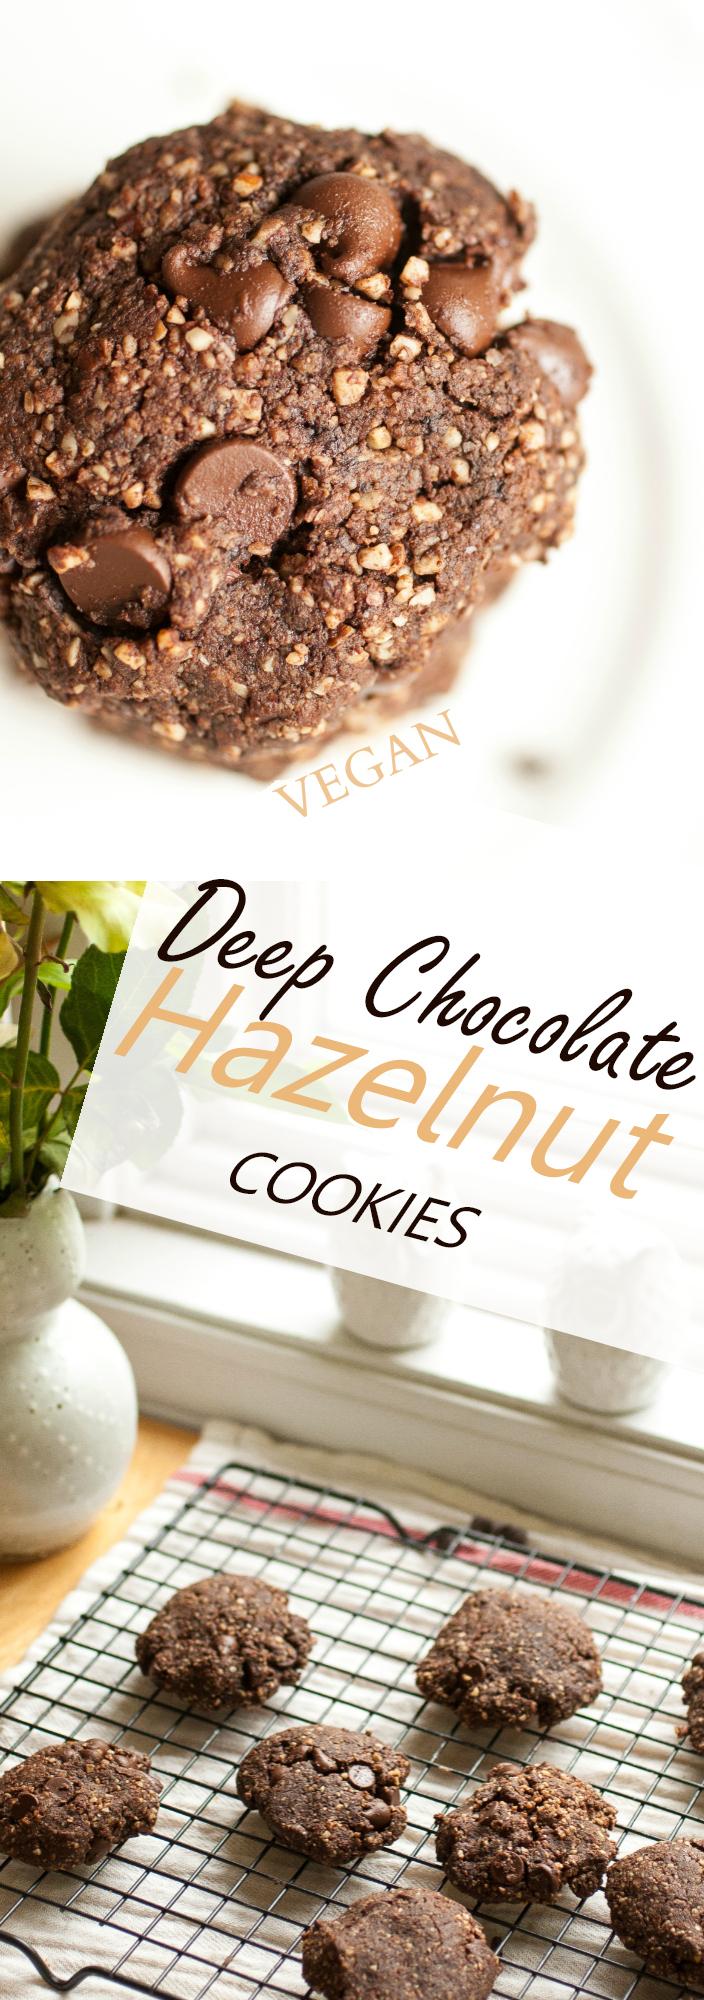 Produce On Parade - Deep Chocolate Hazelnut Cookies